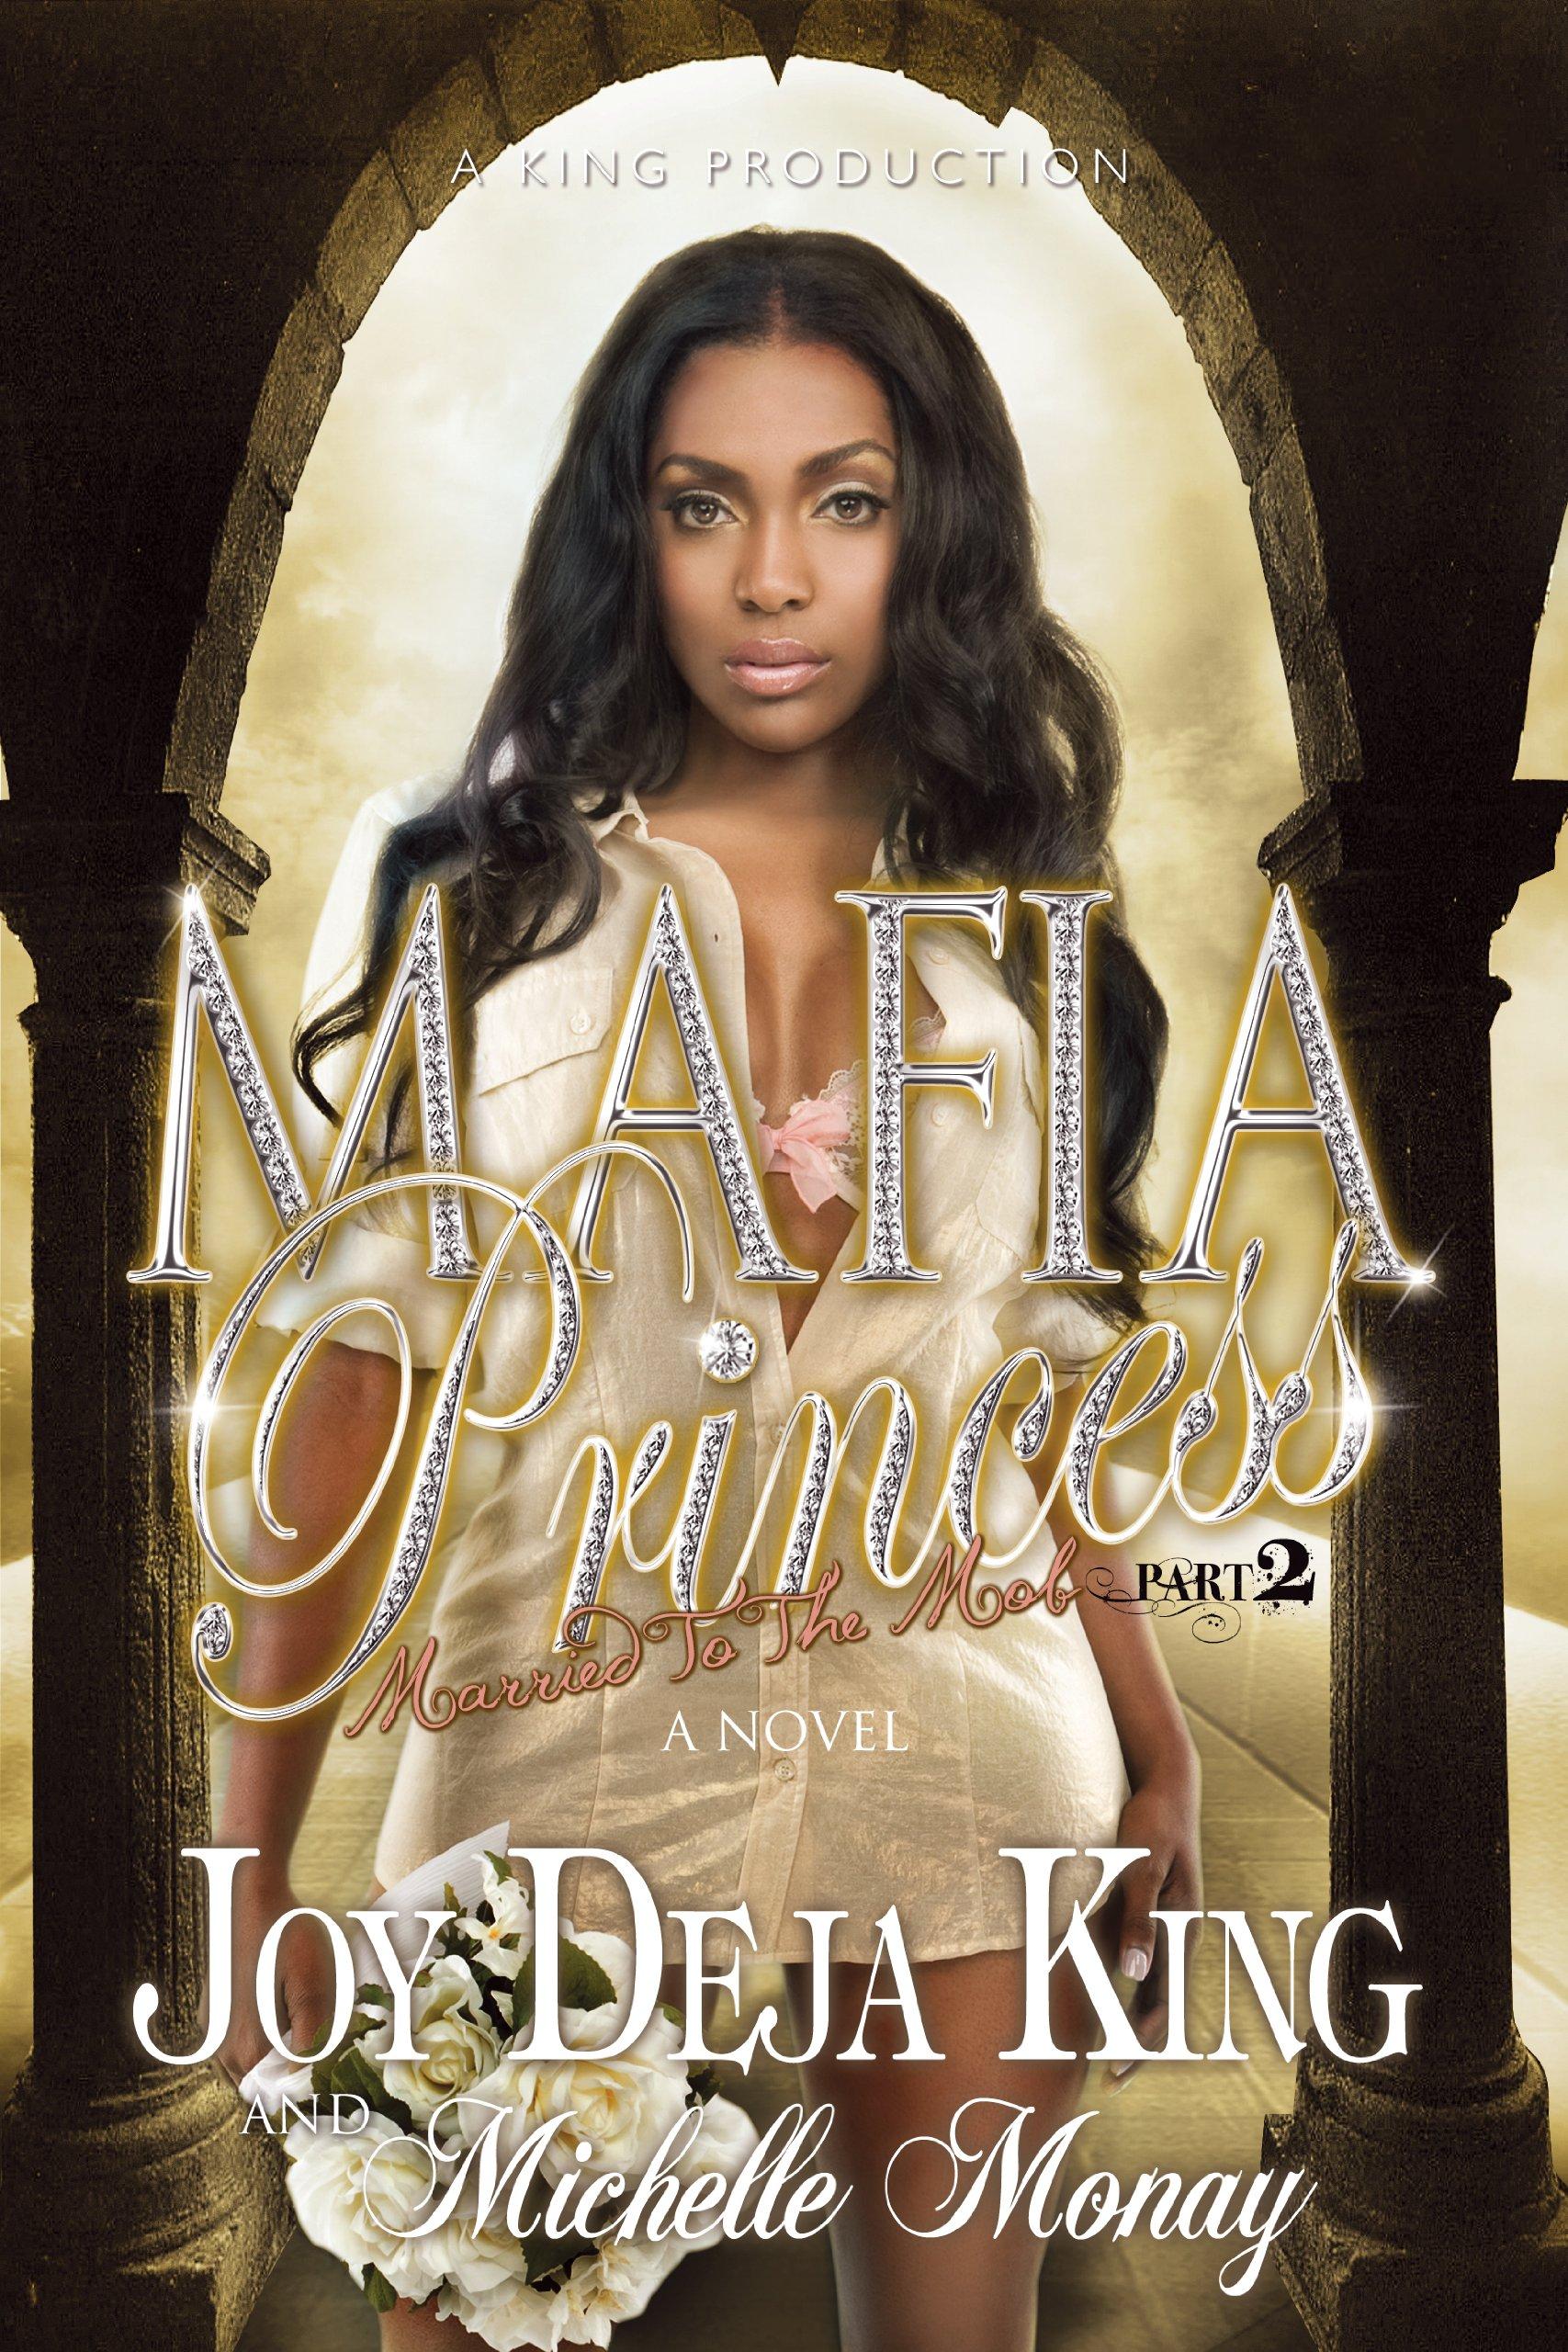 Mafia Princess Part 2 (Married To The Mob)